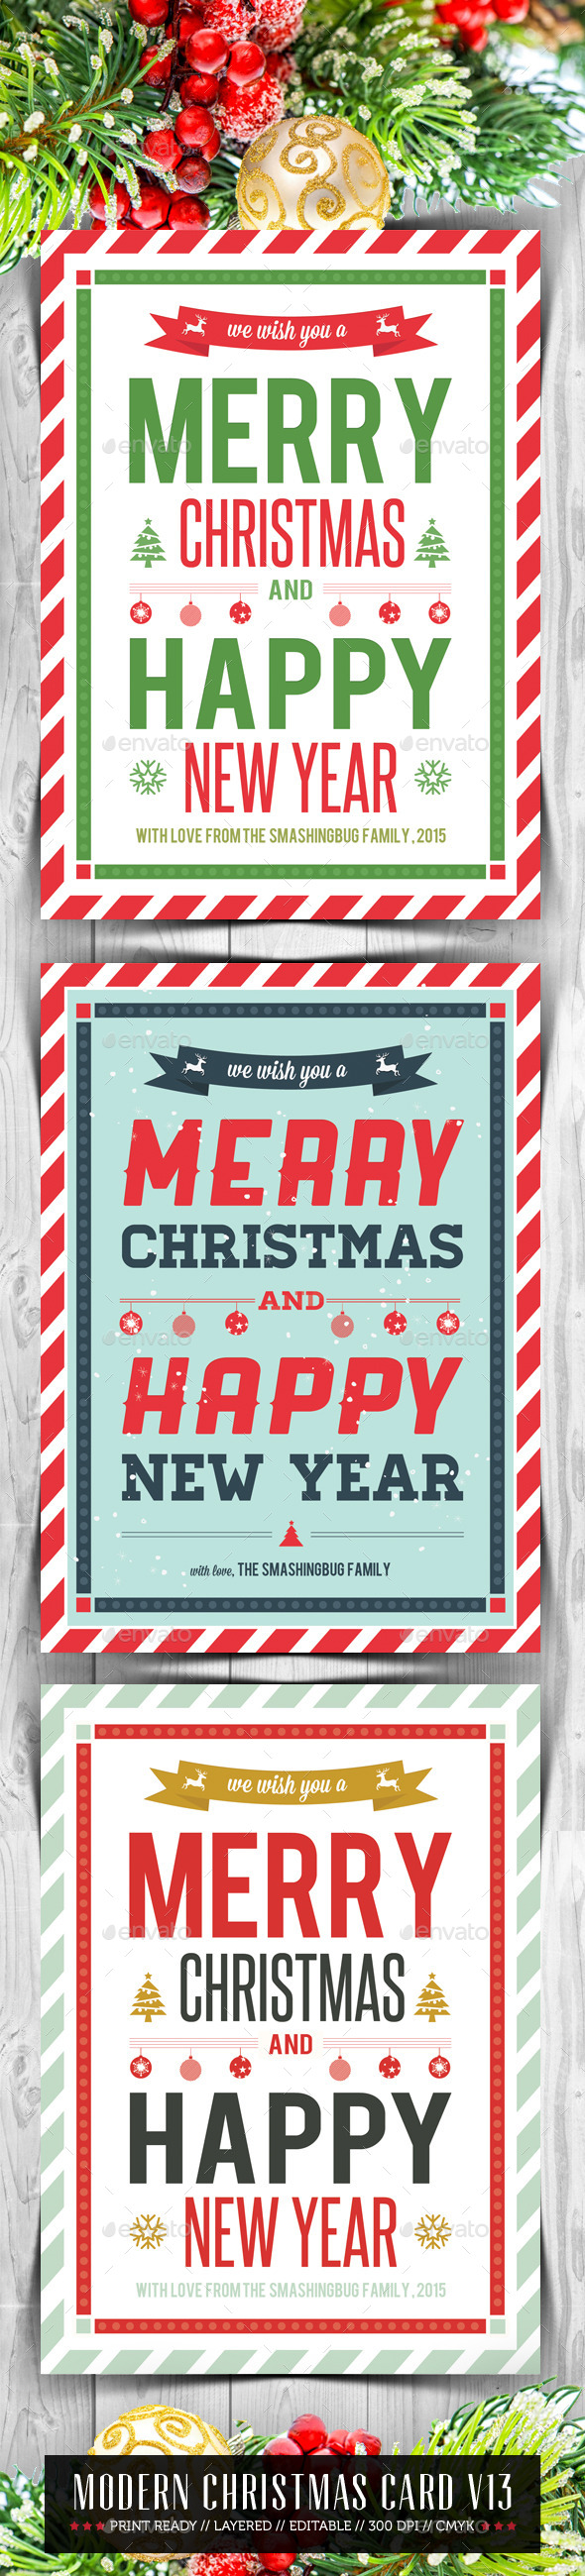 Modern Christmas Card V13 - Holiday Greeting Cards